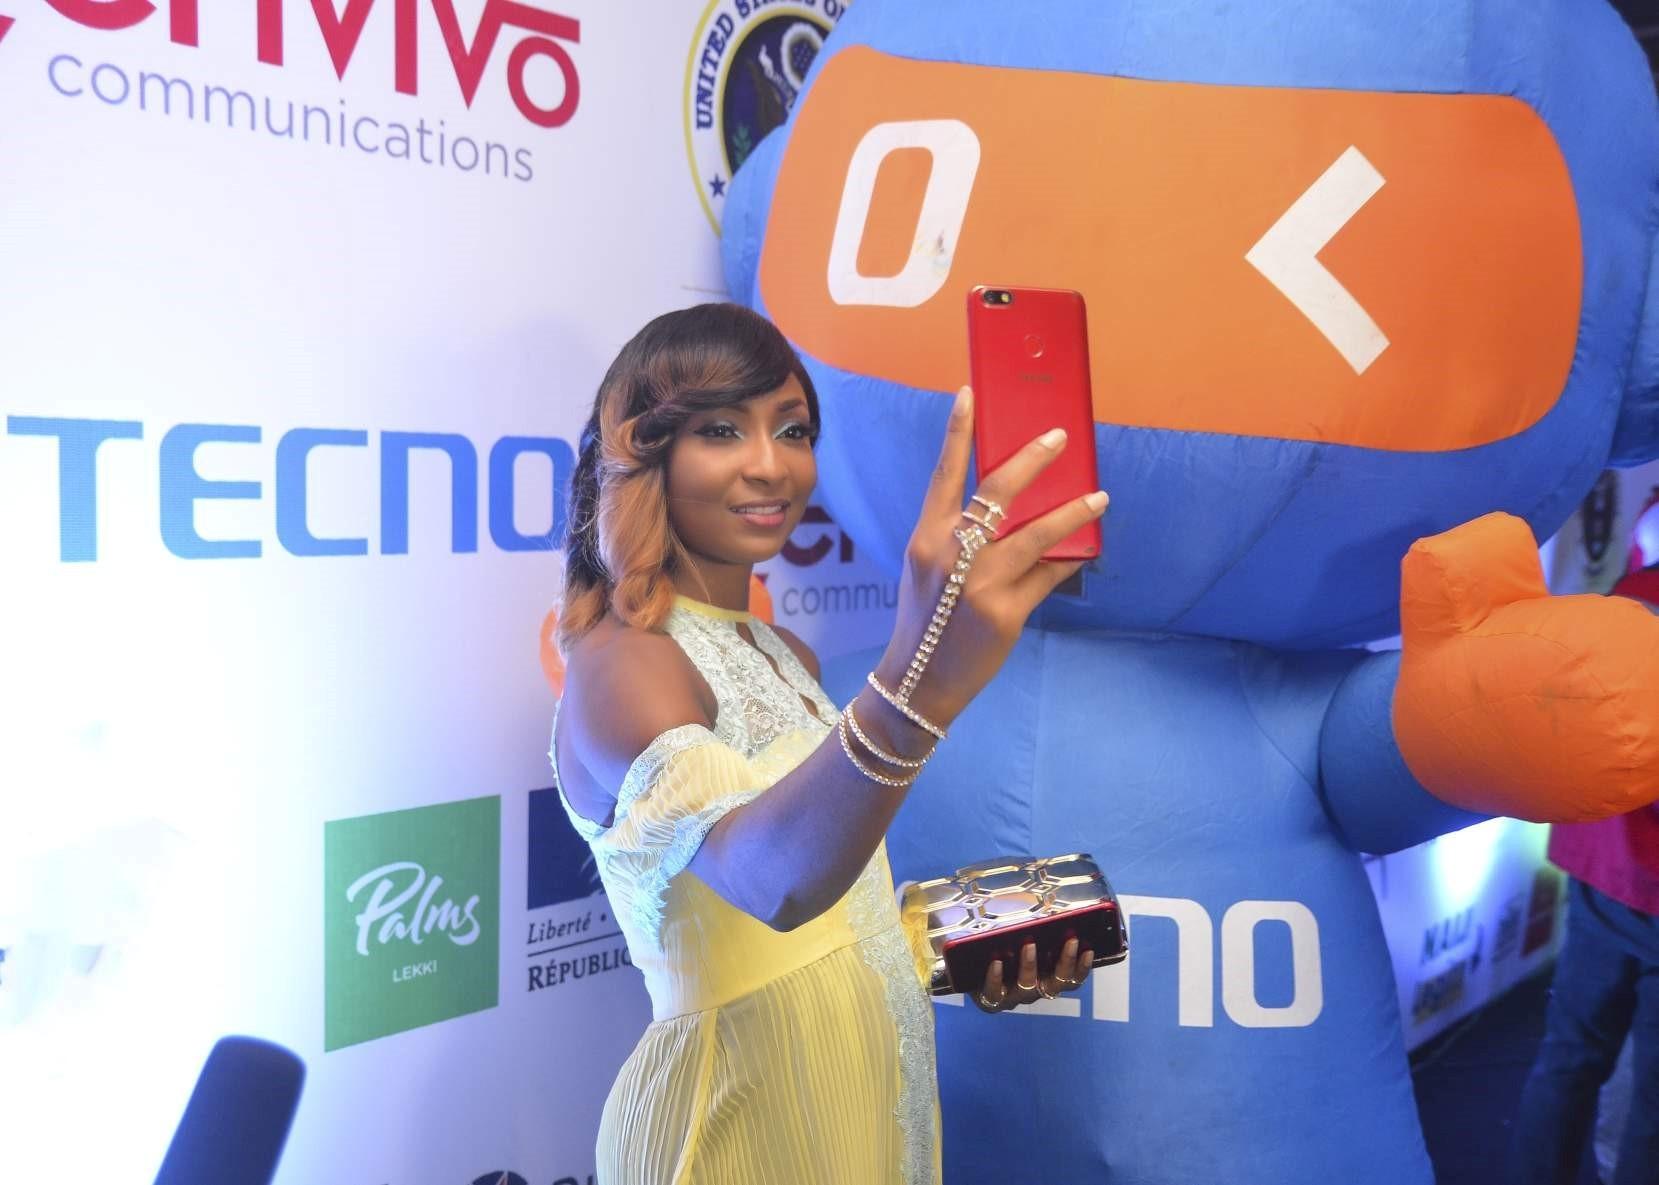 AFRIFF 2018 through the lens of Tecno Mobile